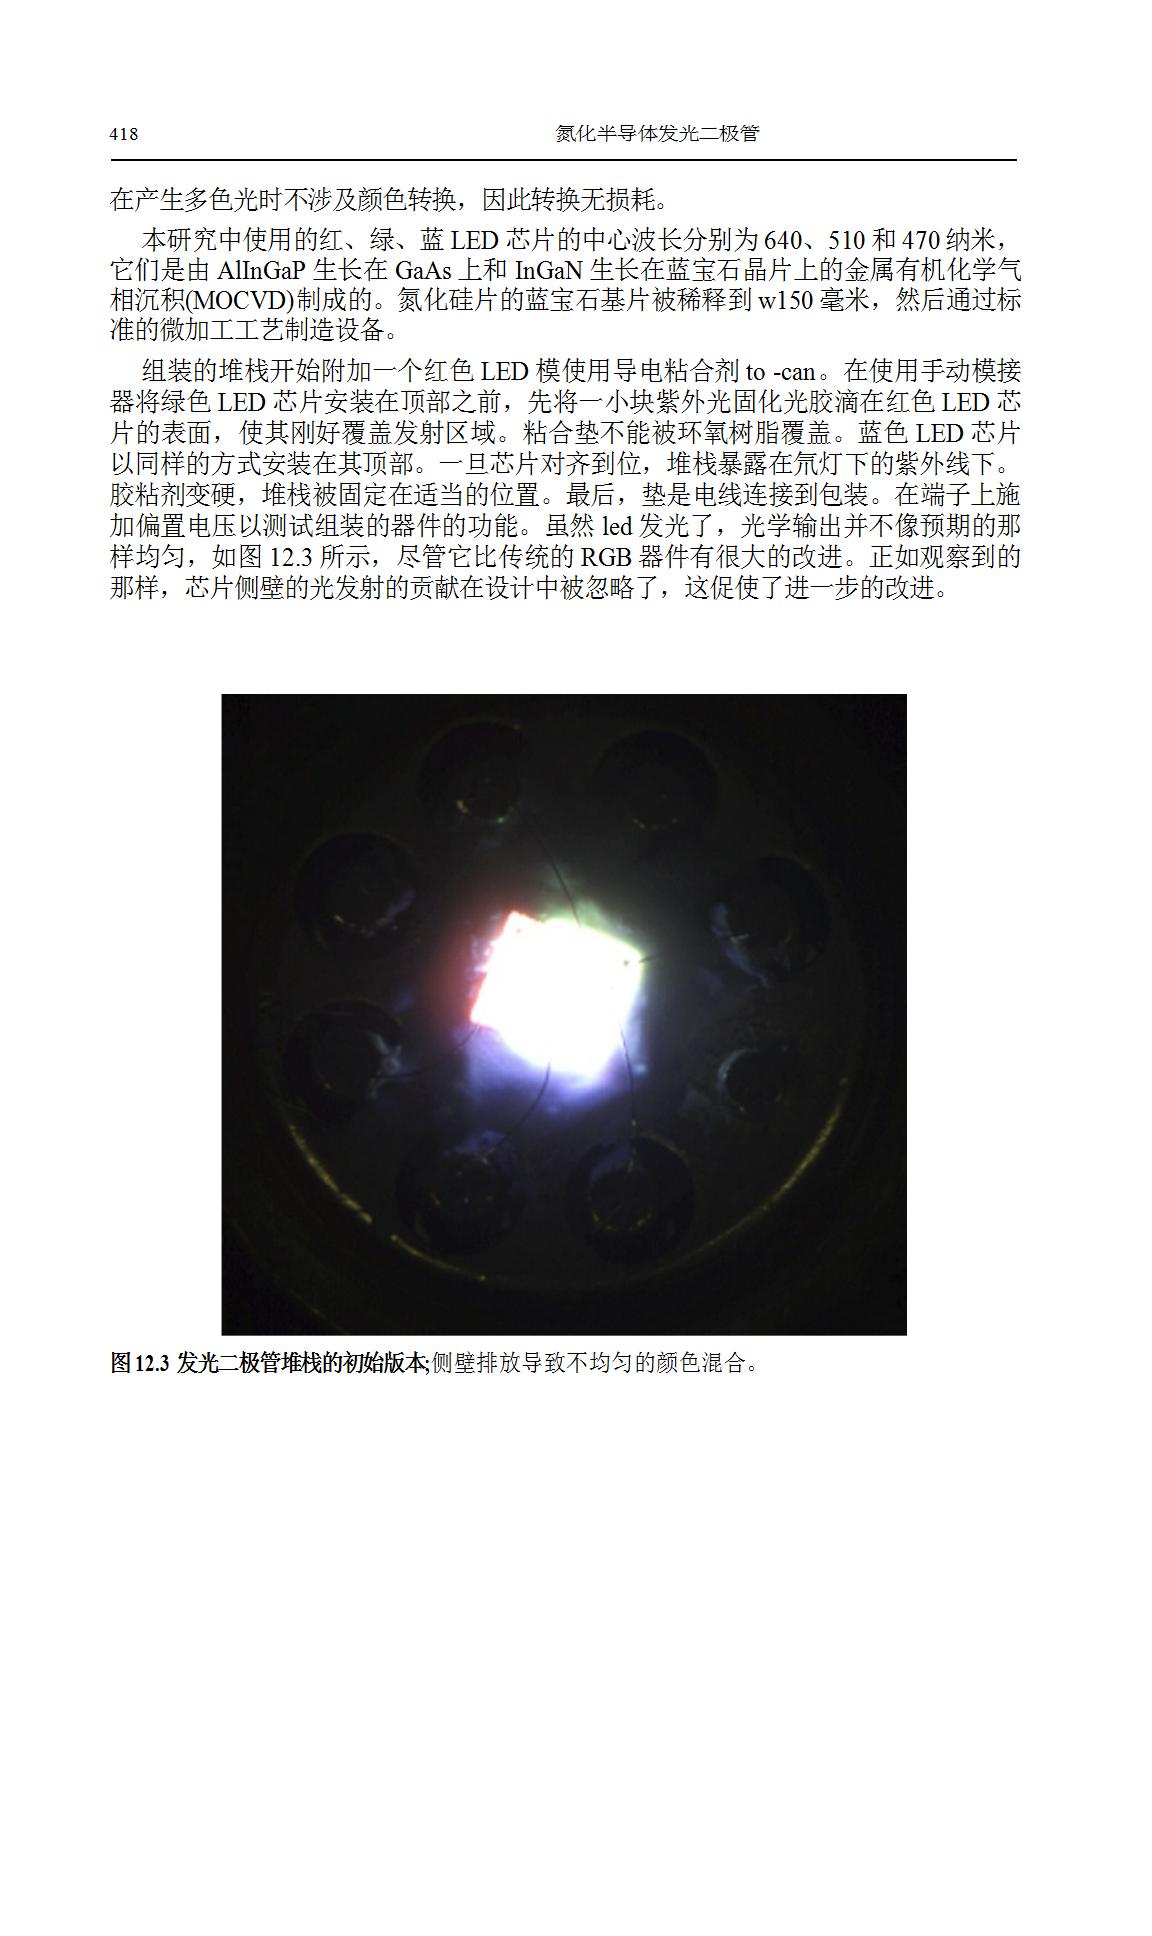 LED调色和像素化MicroLED阵列研究  第4张